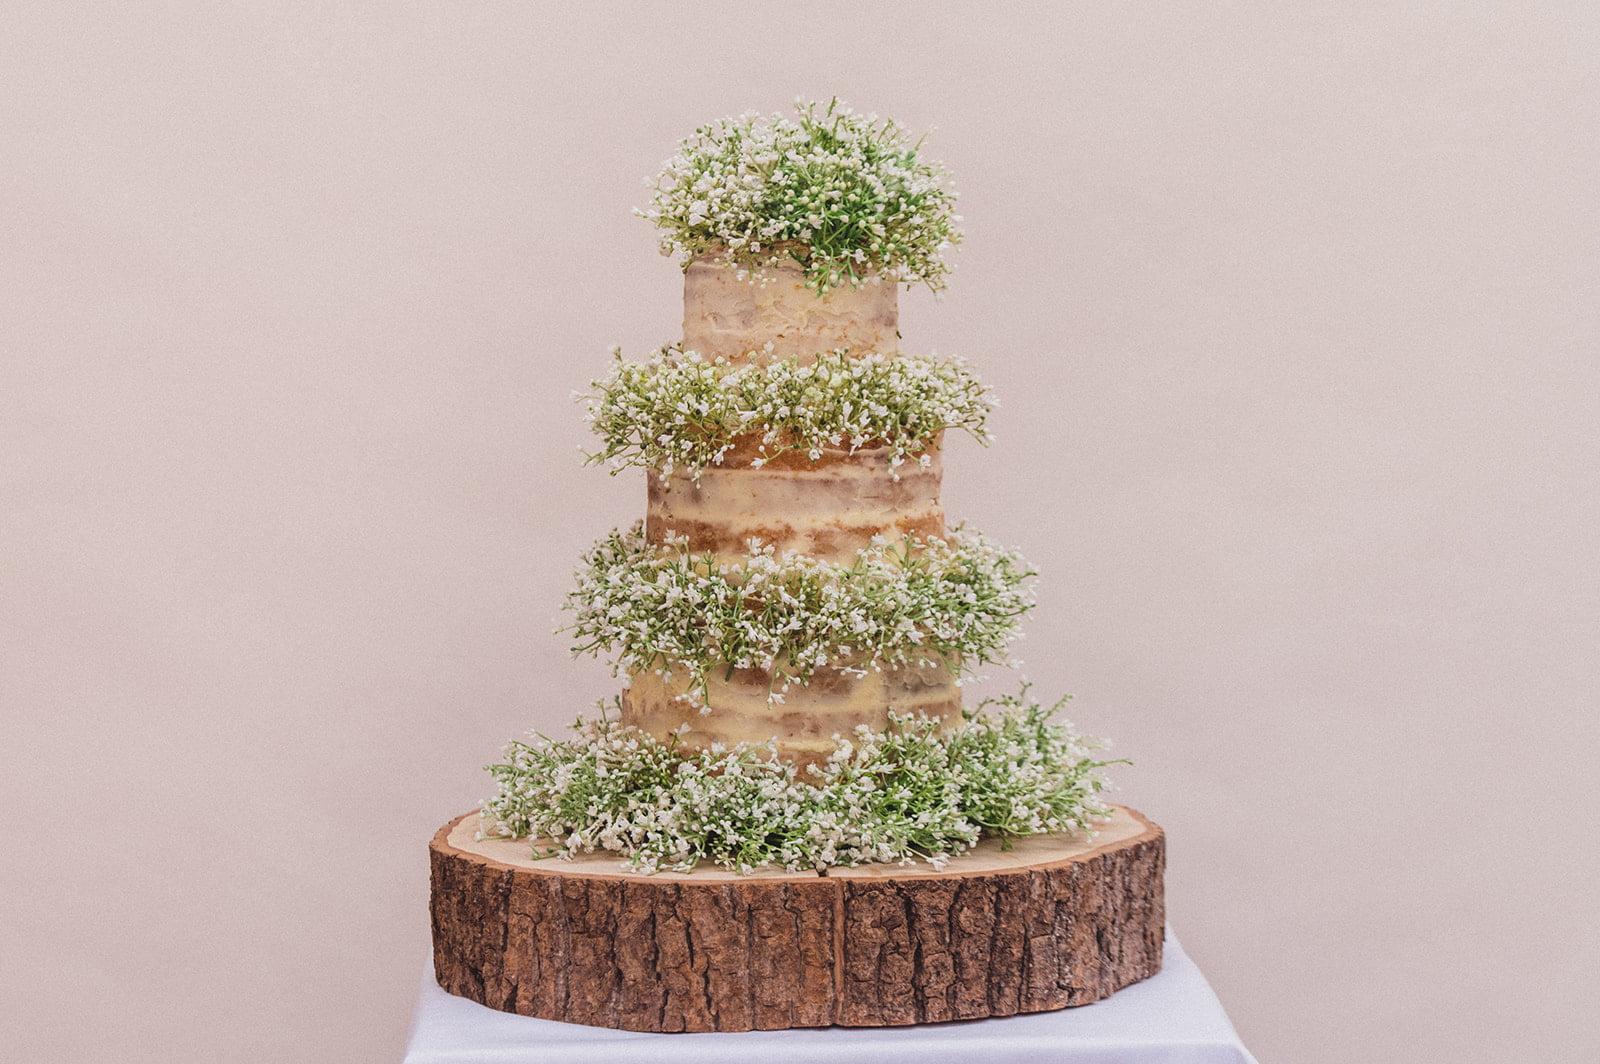 Nearly Naked Wedding Cake filled with Gypsophila flowers